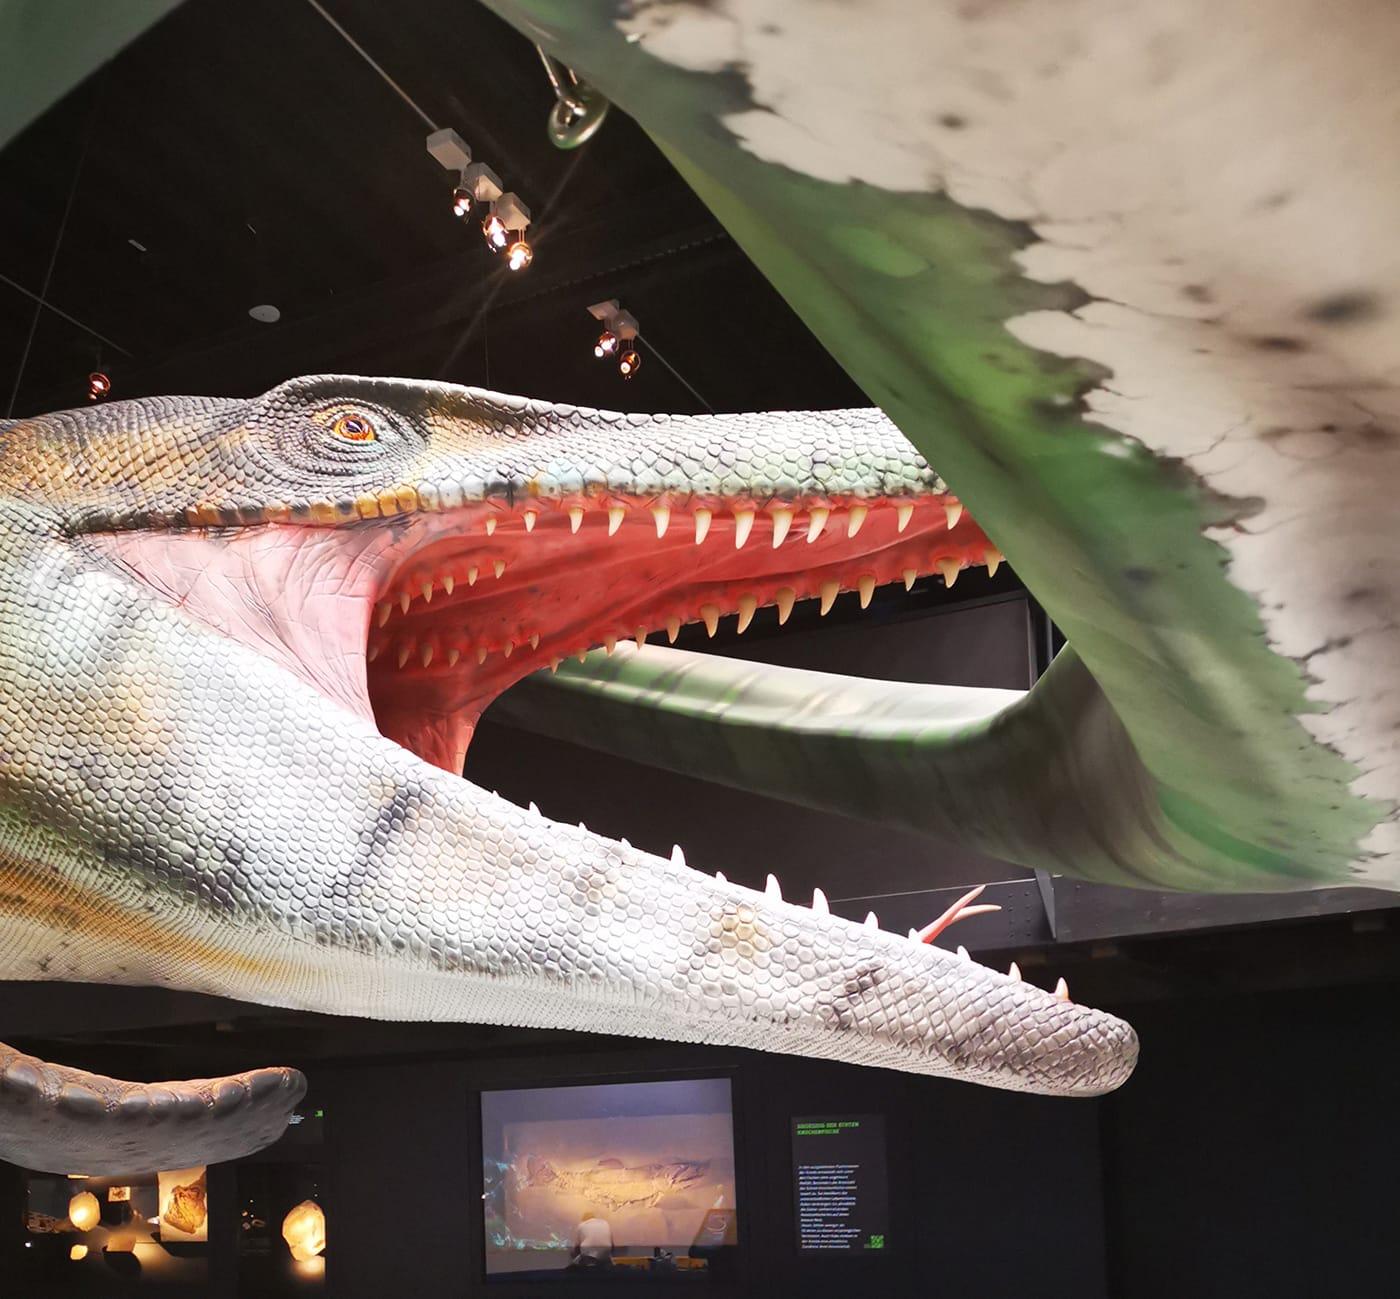 Lokschuppen Rosenheim Dinosaurier // HIMBEER